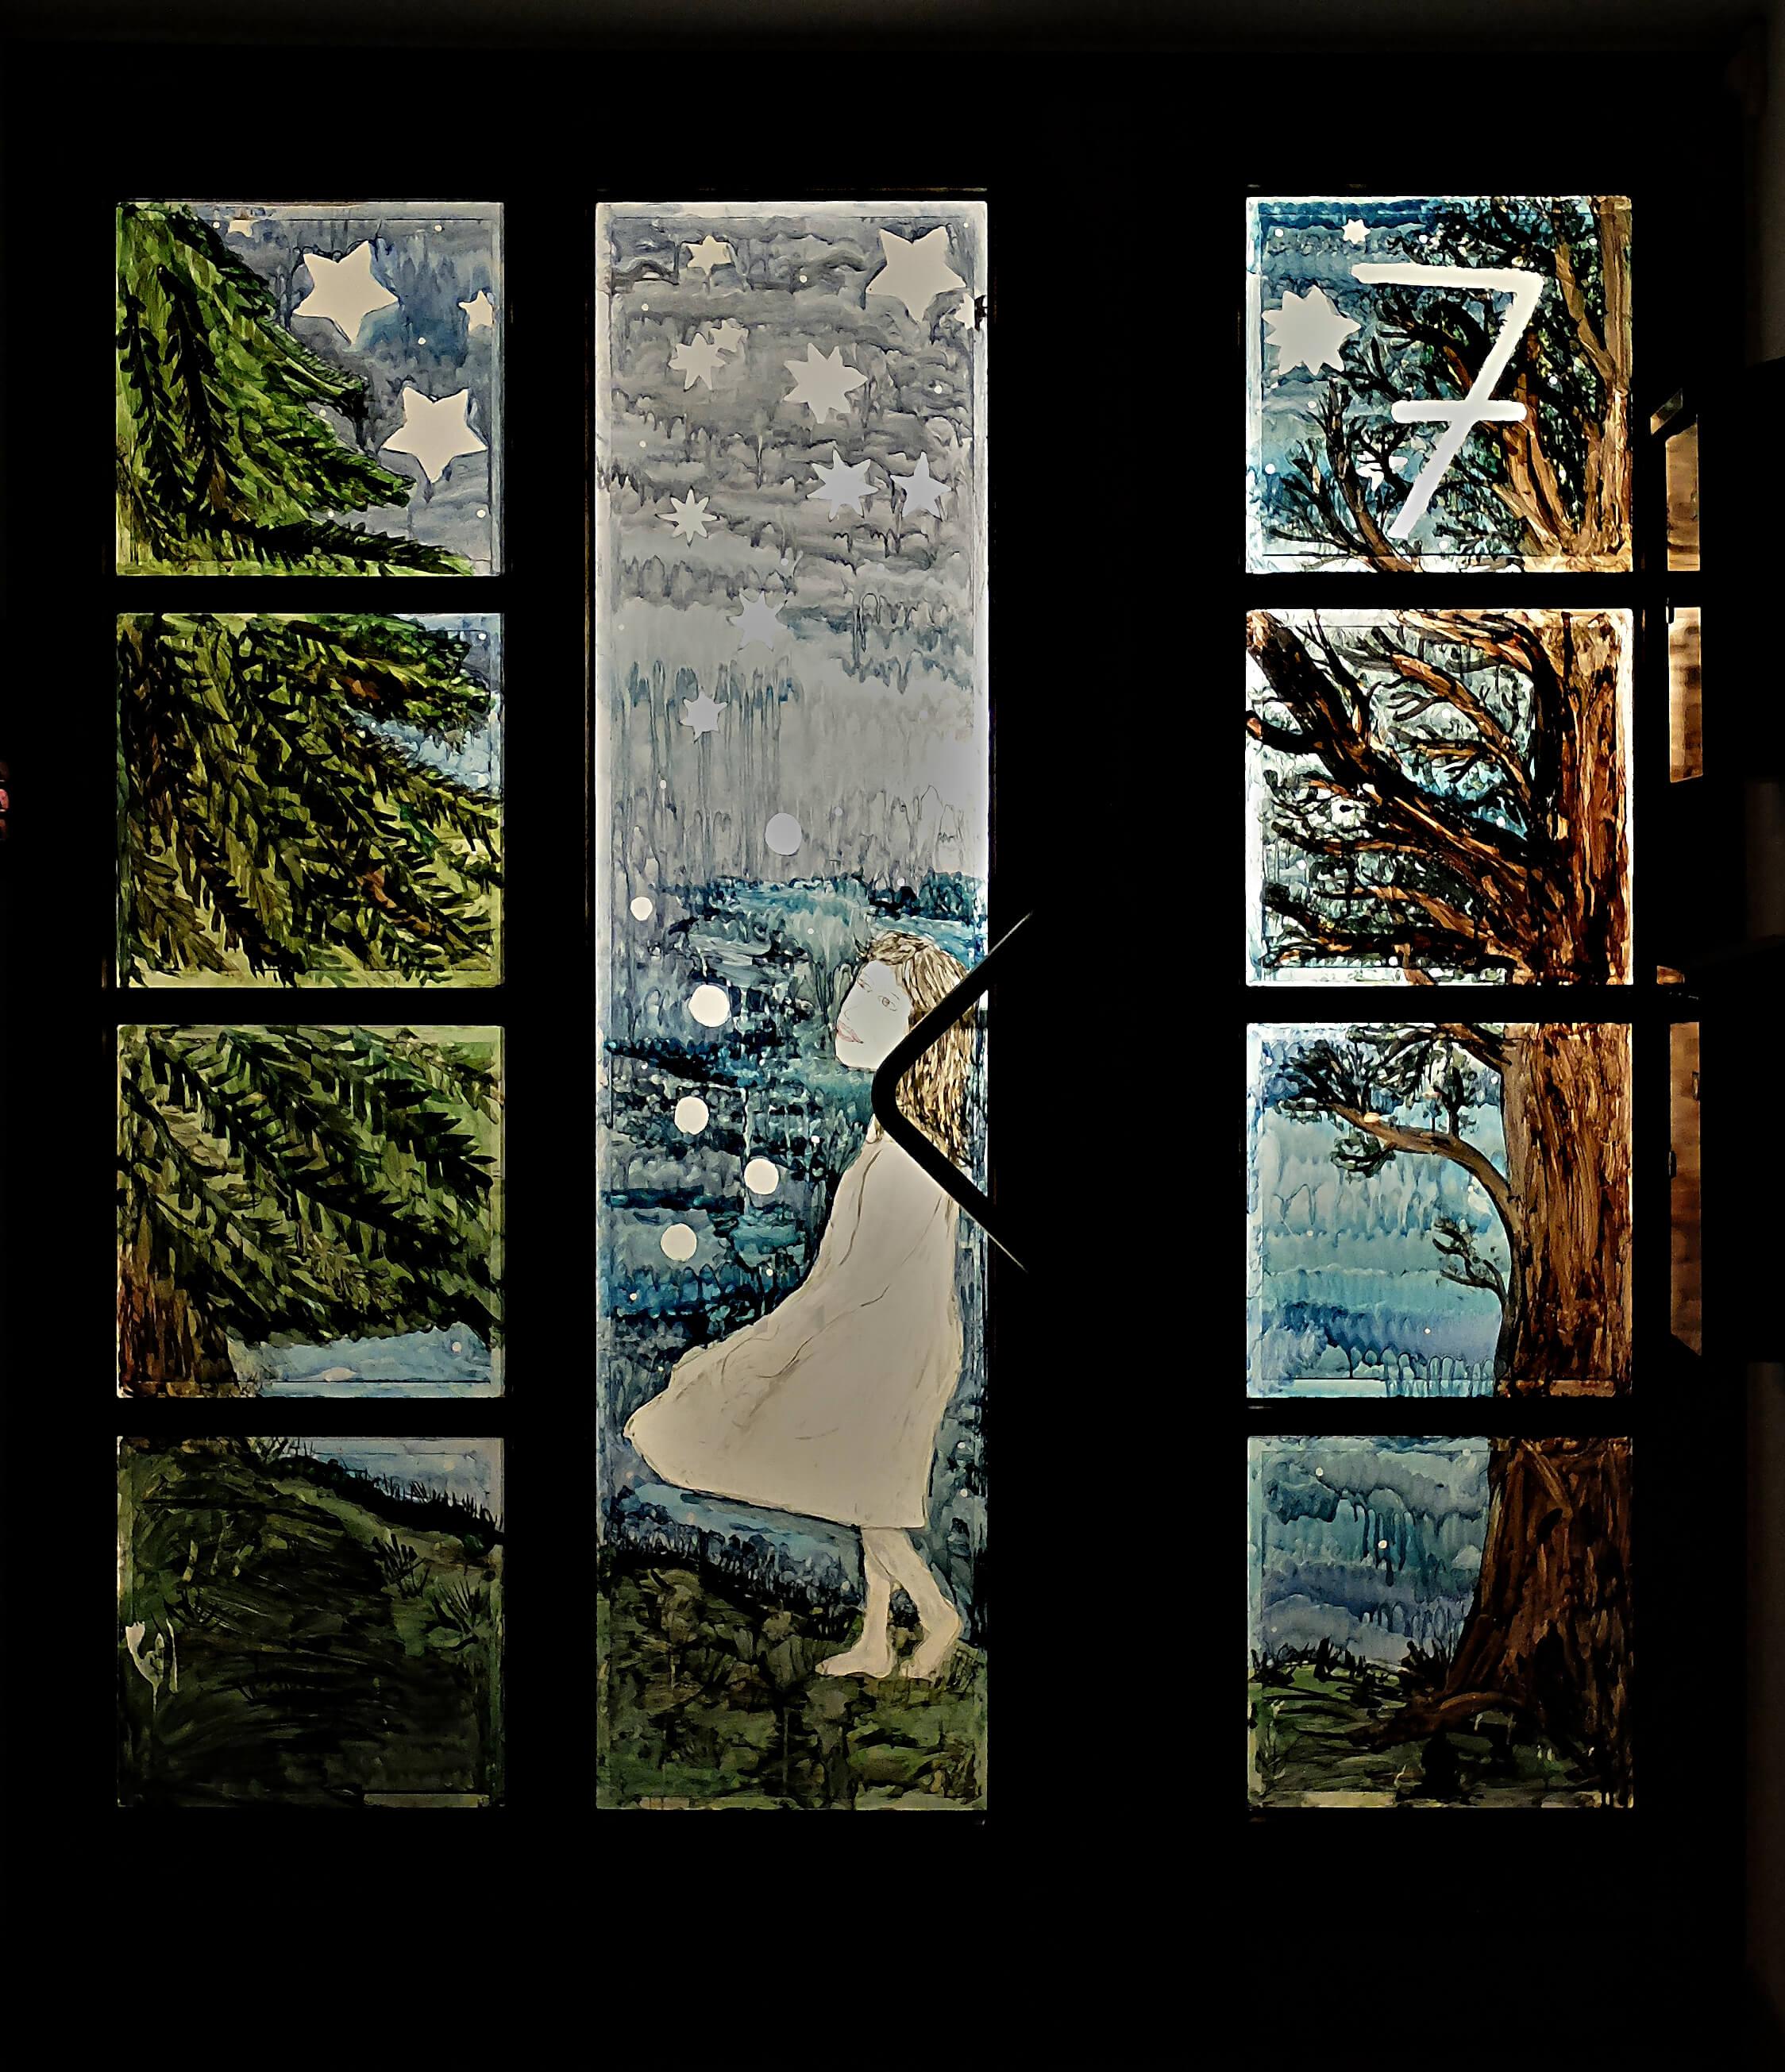 Adventskalender im Fenster